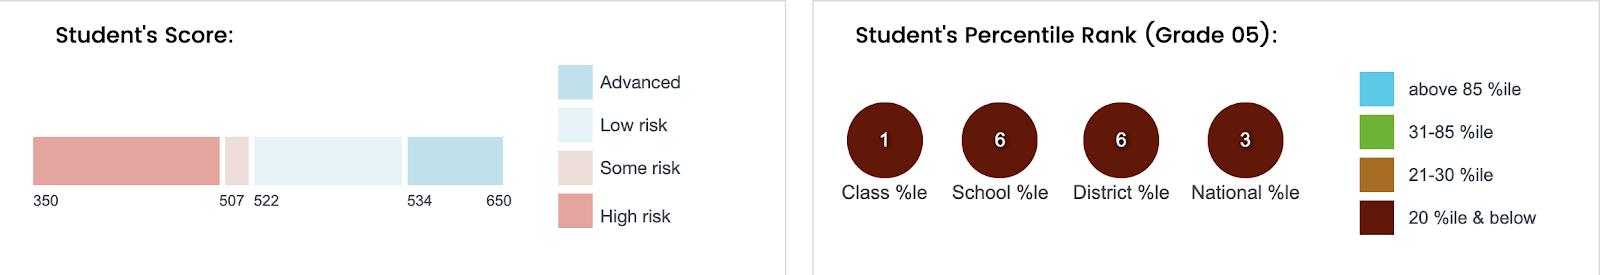 Student Score